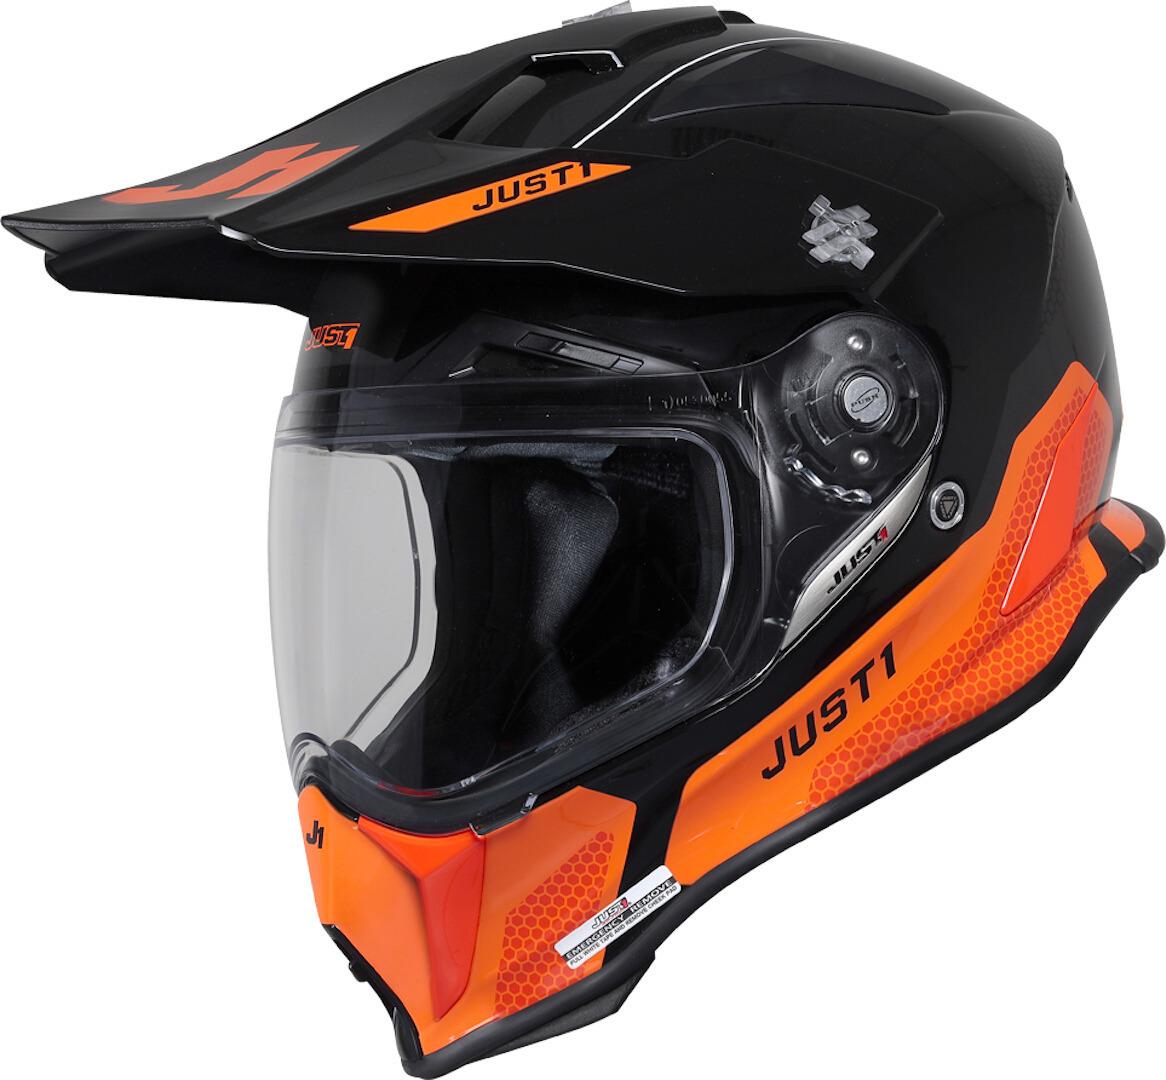 Just1 J14-F Elite Motocross Helm, schwarz-orange, Größe XS, schwarz-orange, Größe XS